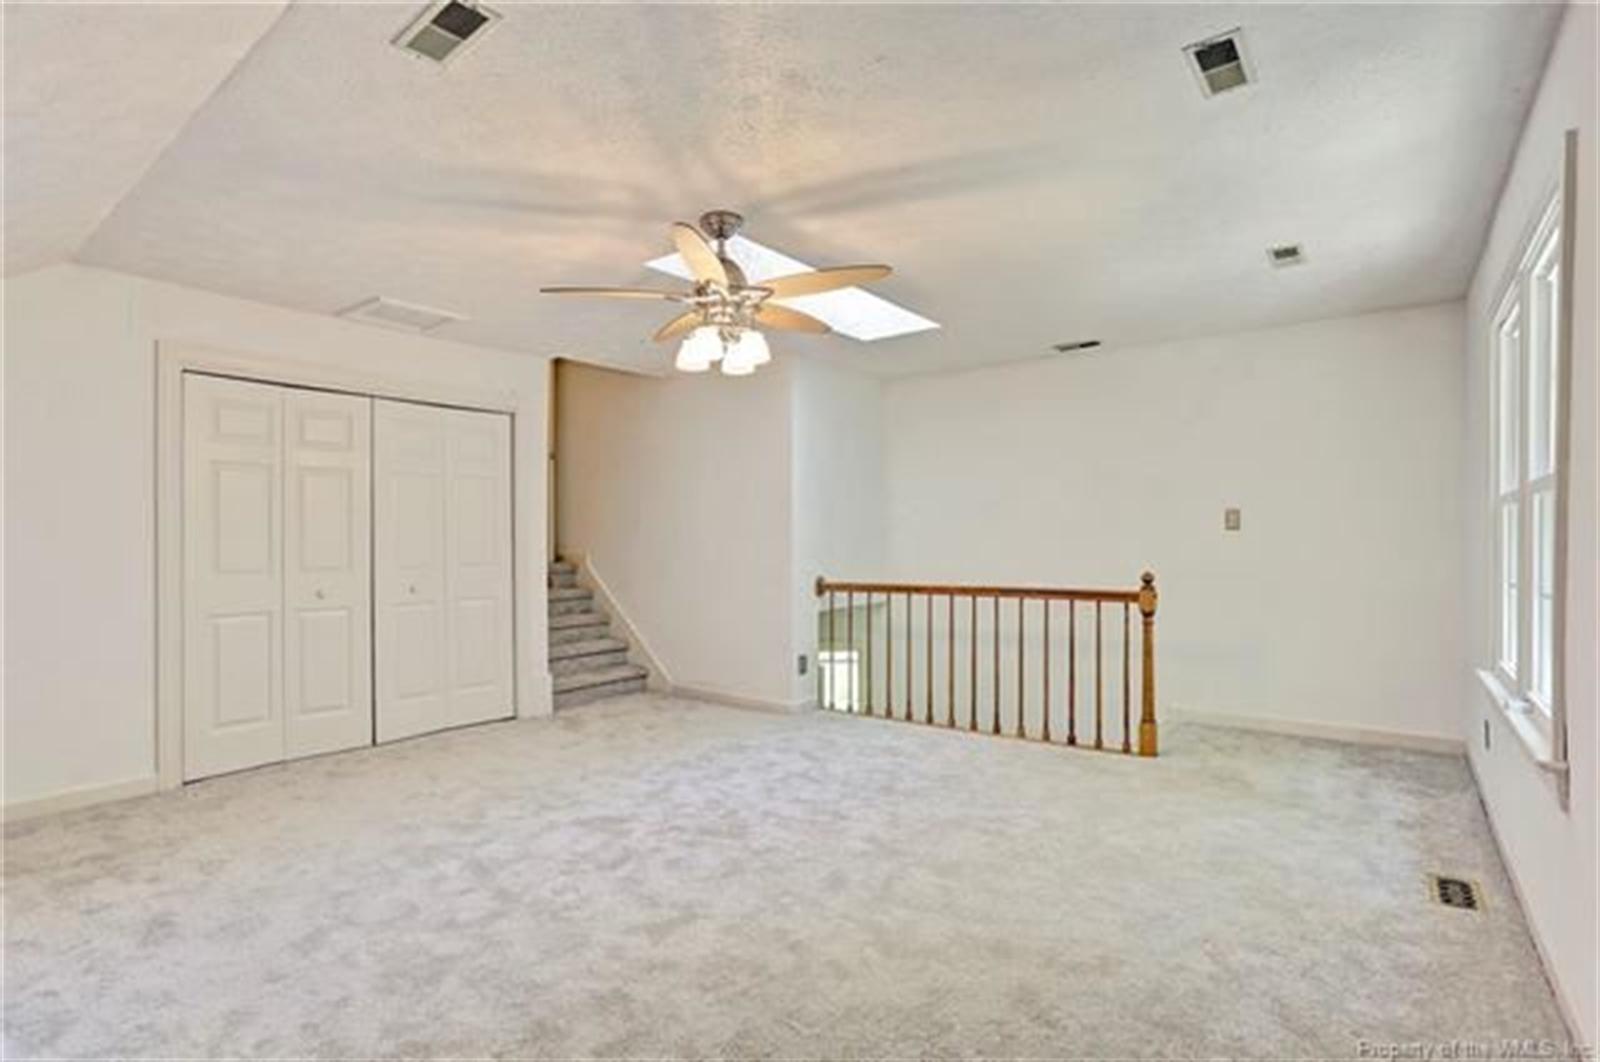 Real Estate Photography - 104 Holloway Dr, Williamsburg, VA, 23185 - Location 23